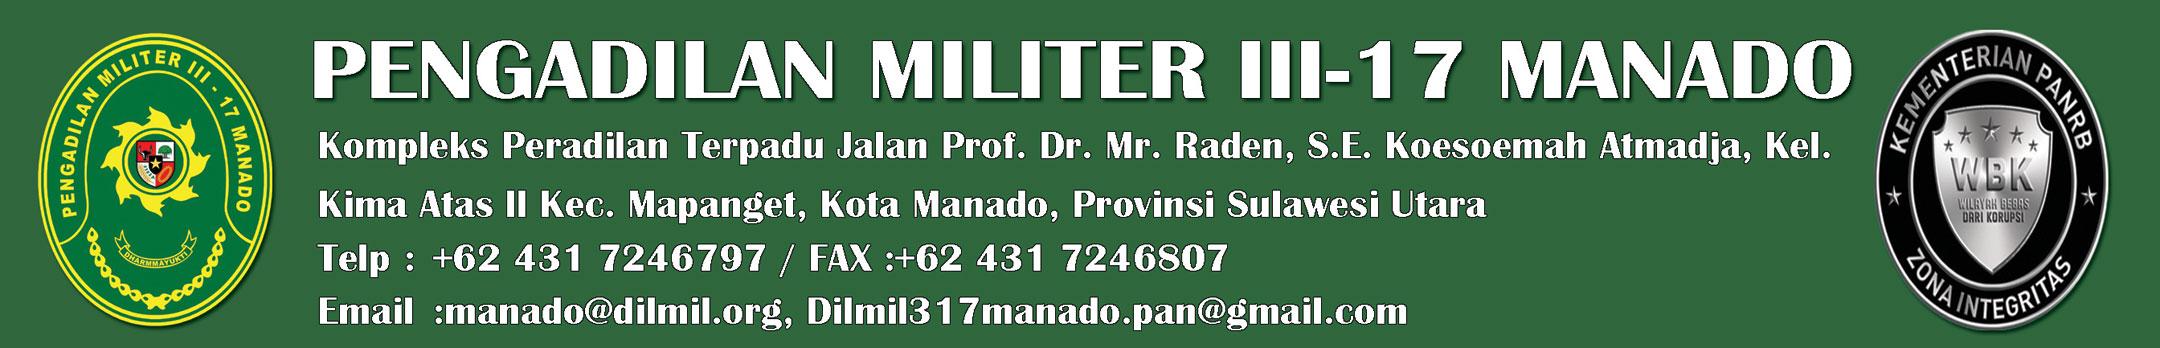 Pengadilan Militer III-17 Manado